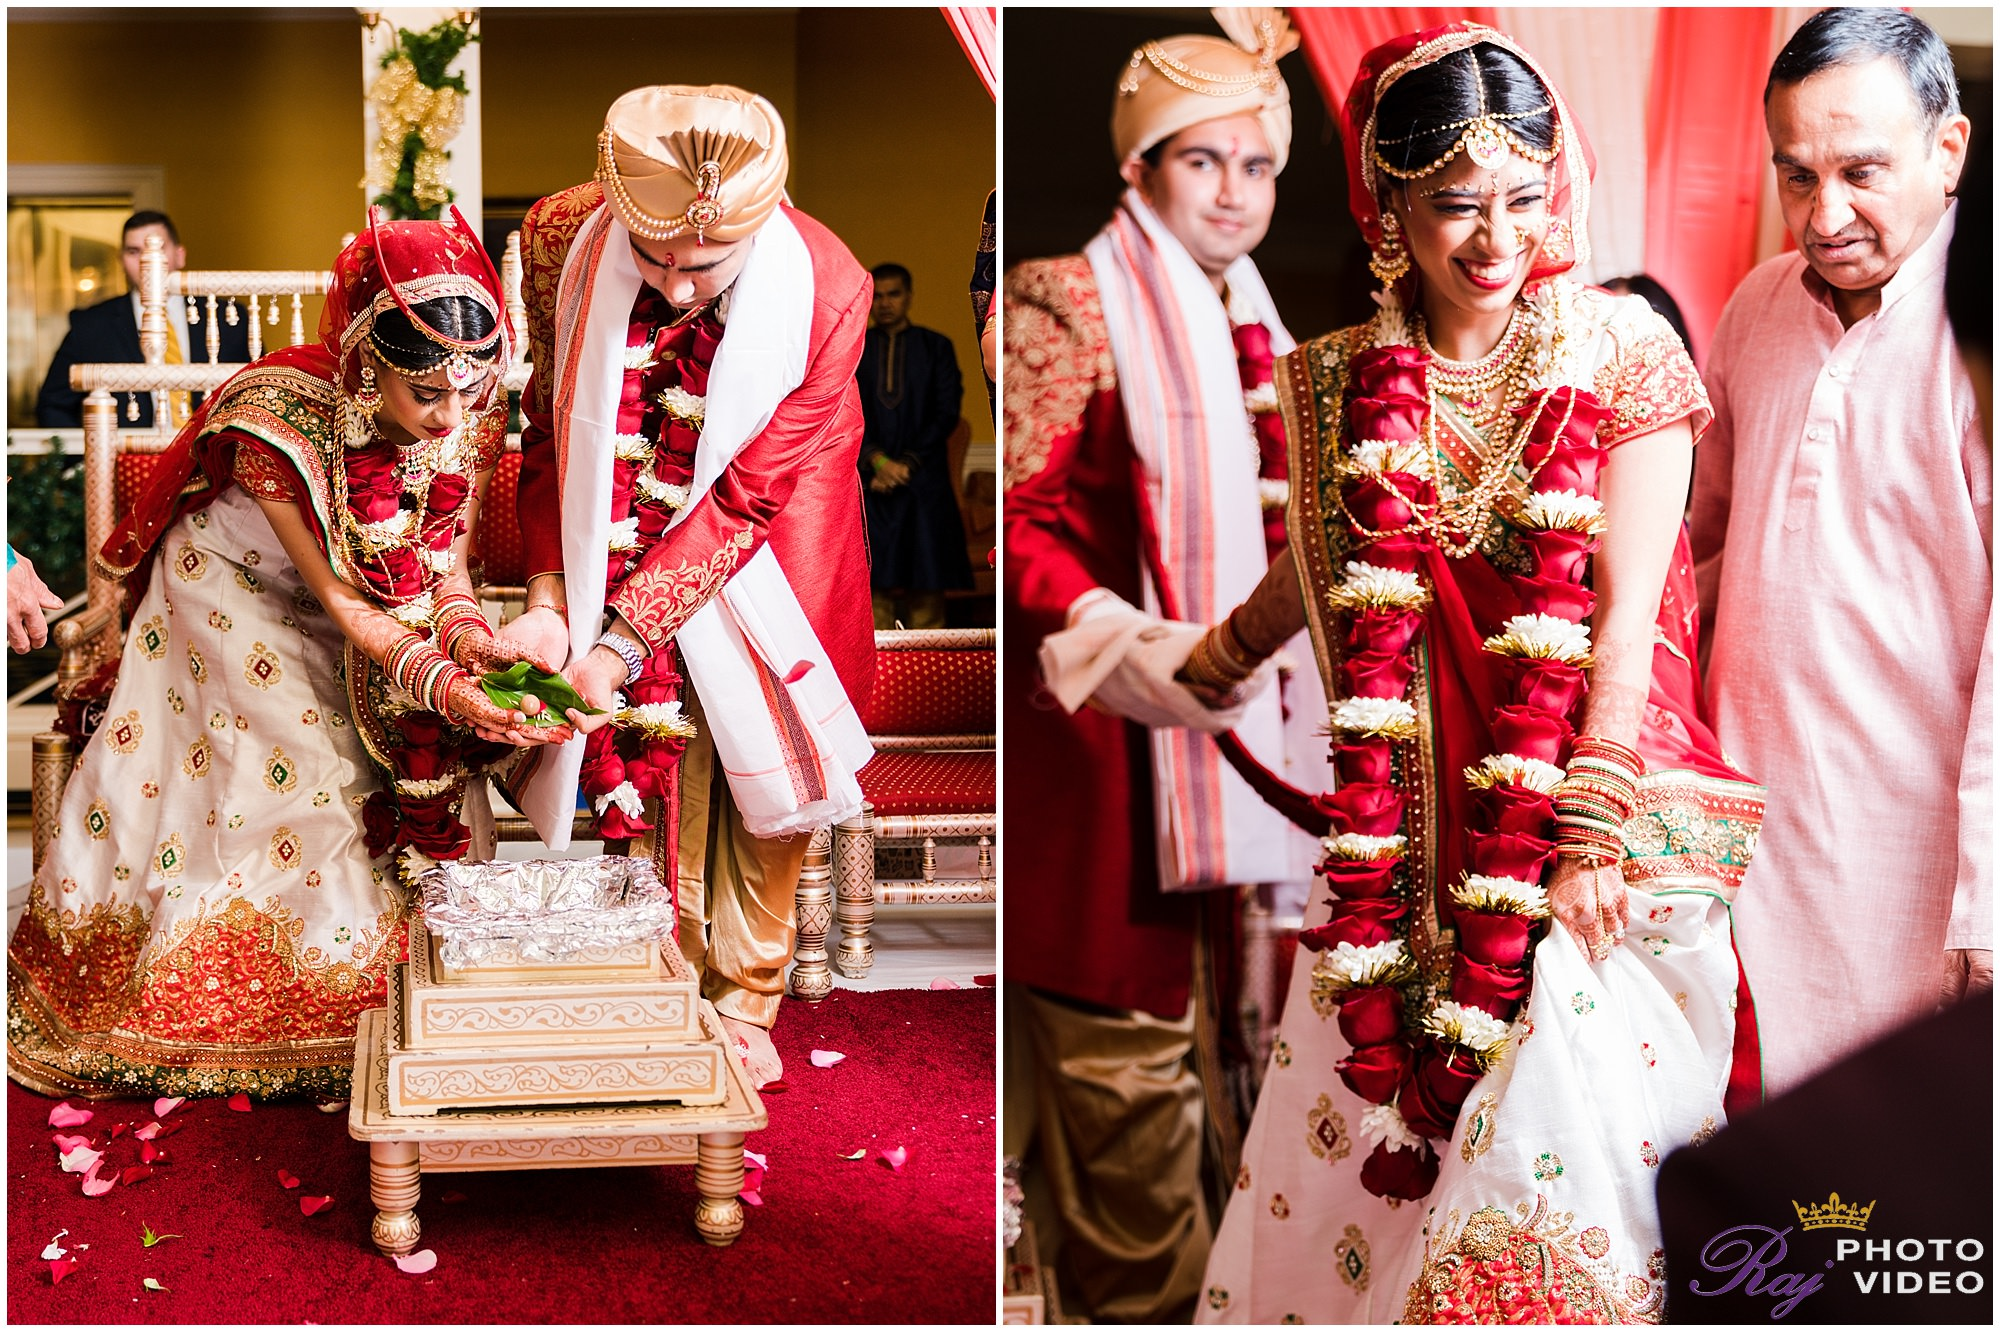 Founders-Inn-and-Spa-Virginia-Beach-VA-Indian-Wedding-Harini-Vivek-40.jpg